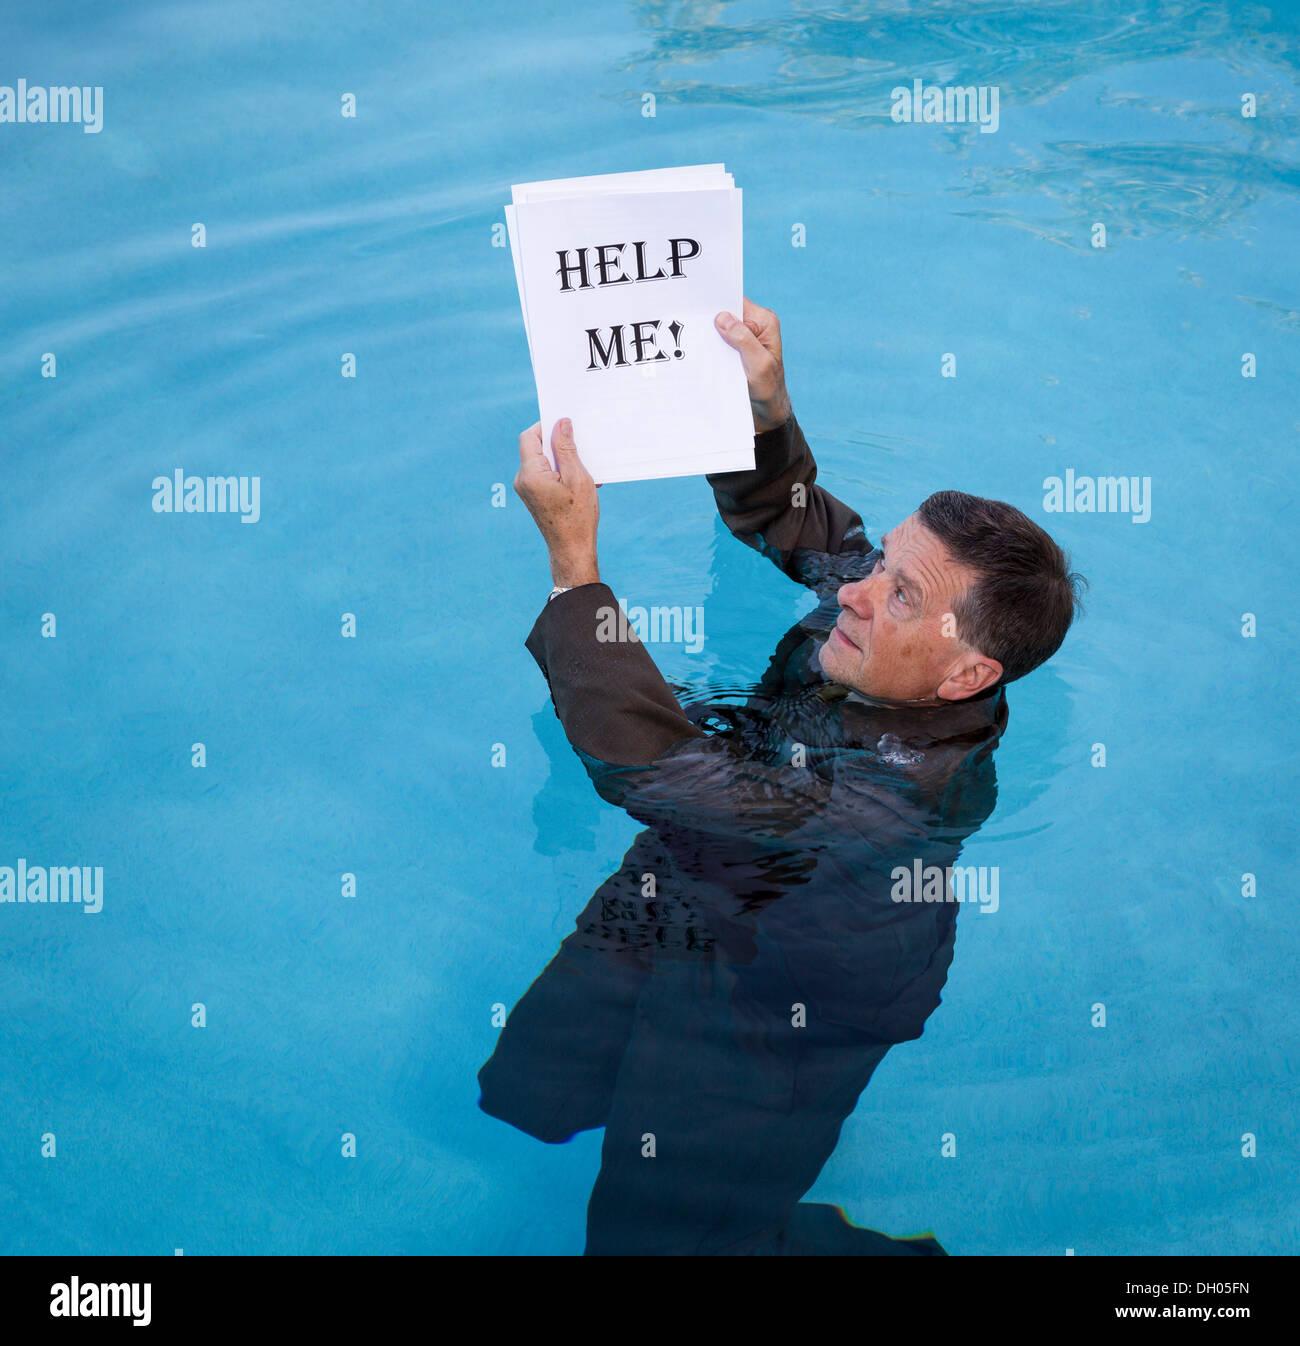 Business man in debt - help concept - Stock Image